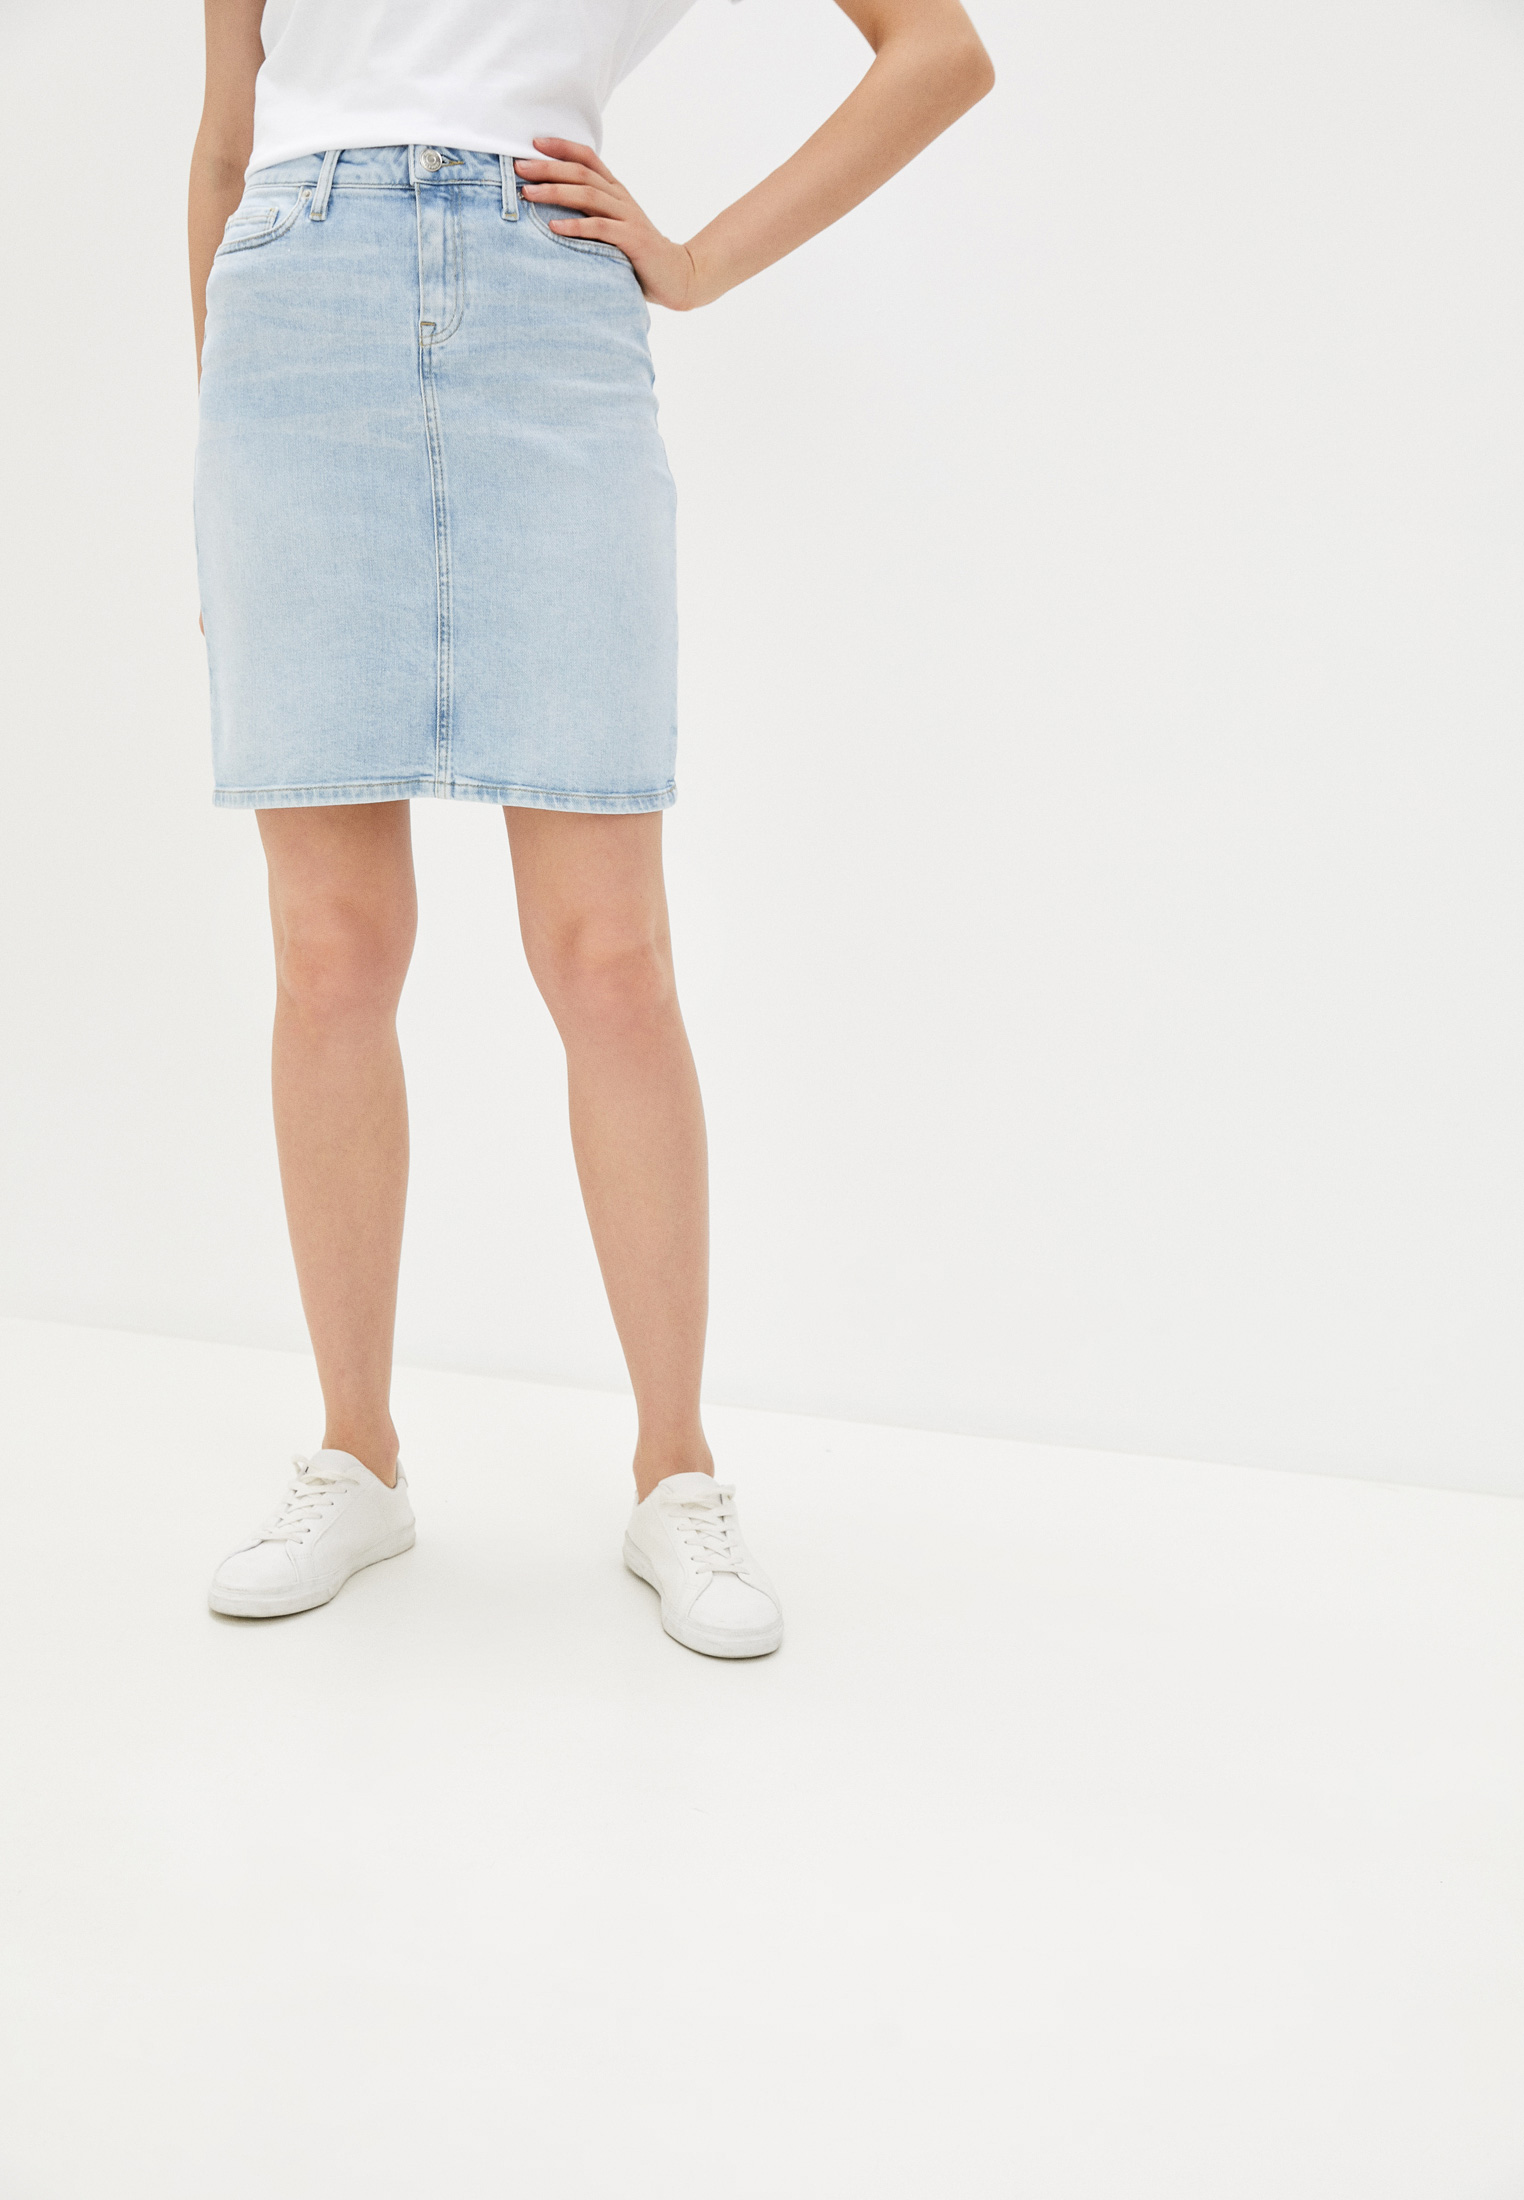 Джинсовая юбка Tommy Hilfiger (Томми Хилфигер) WW0WW28085